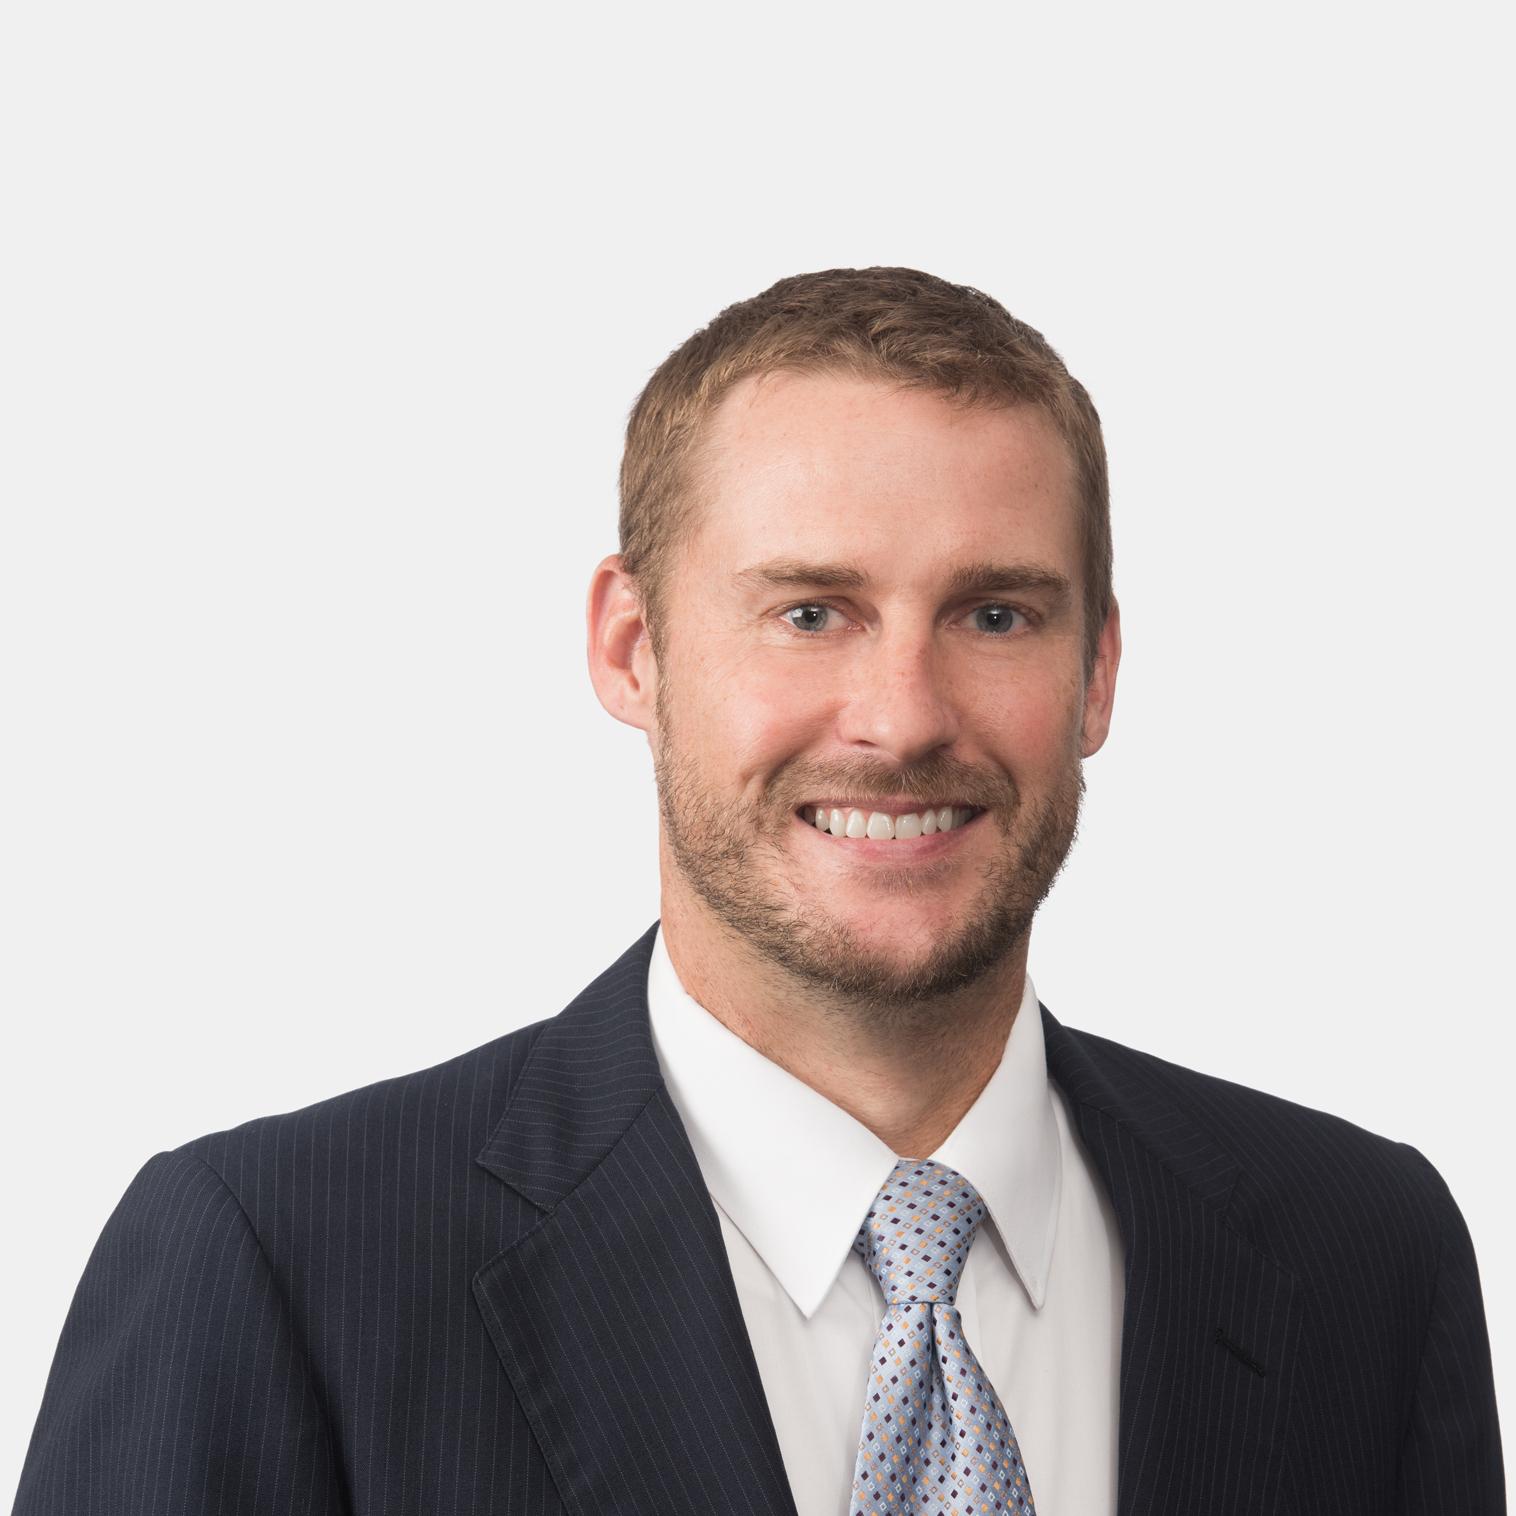 Ryan L. Harding